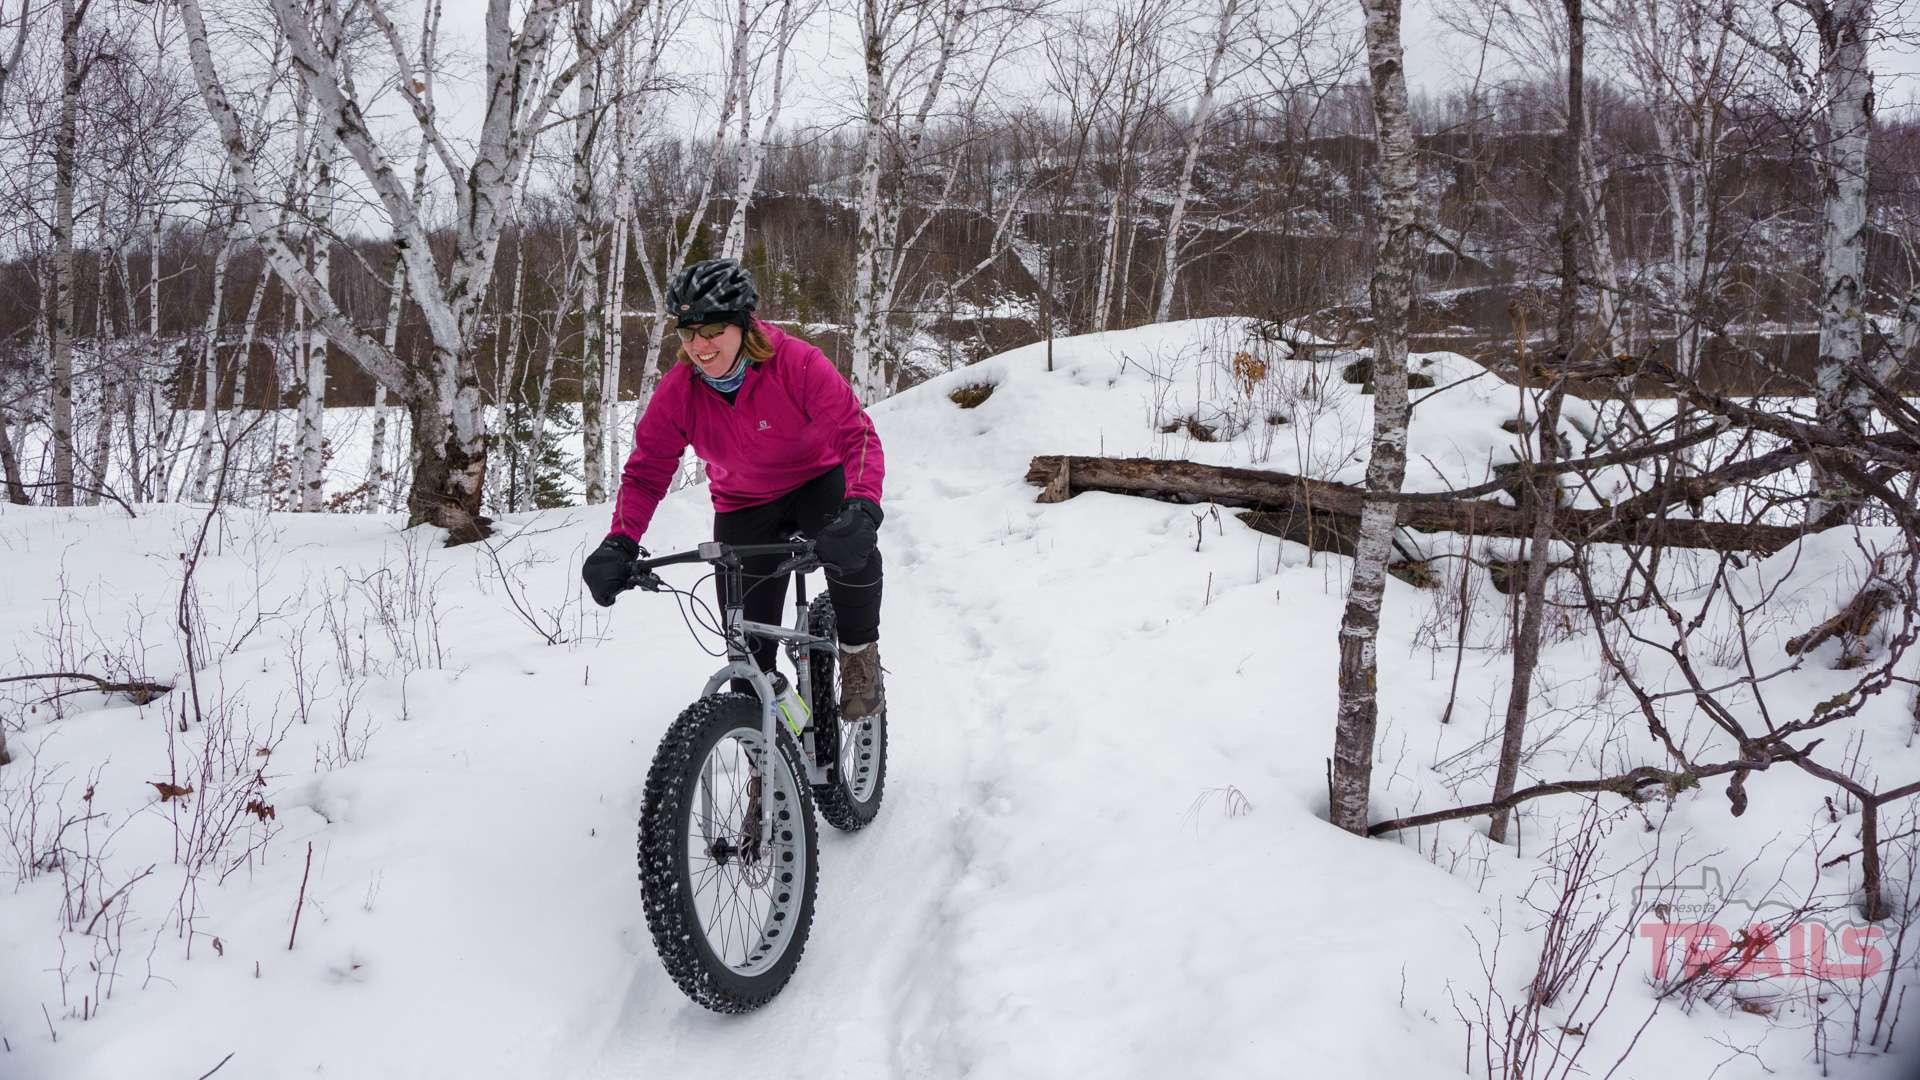 Winter fat biking in the Cuyuna Lakes State Recreation Area